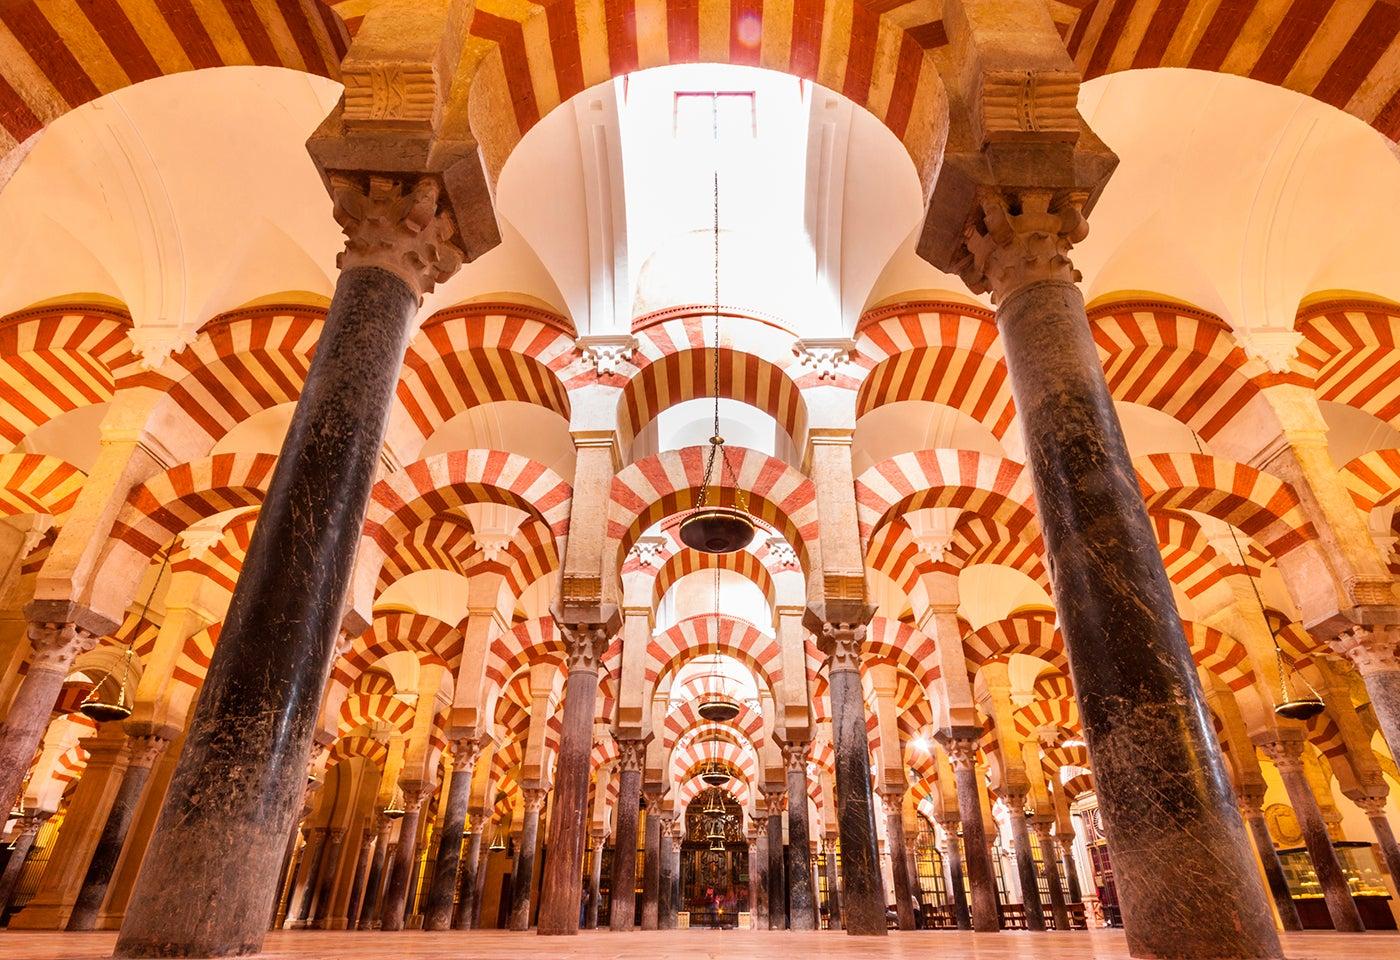 Retazos de la historia de la Mezquita-Catedral de Córdoba